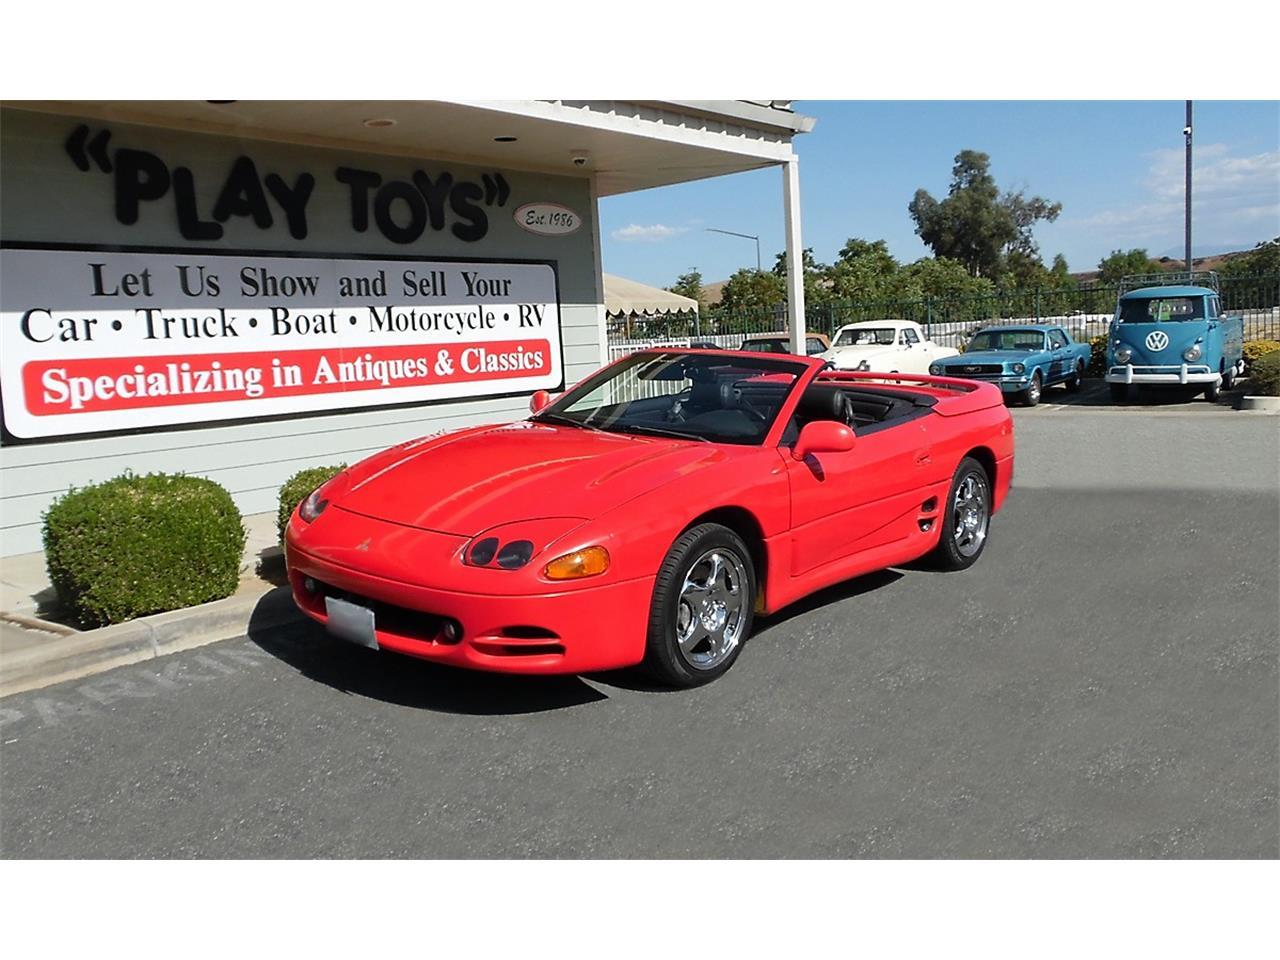 1995 mitsubishi 3000gt vr4 for sale | classiccars | cc-1147393